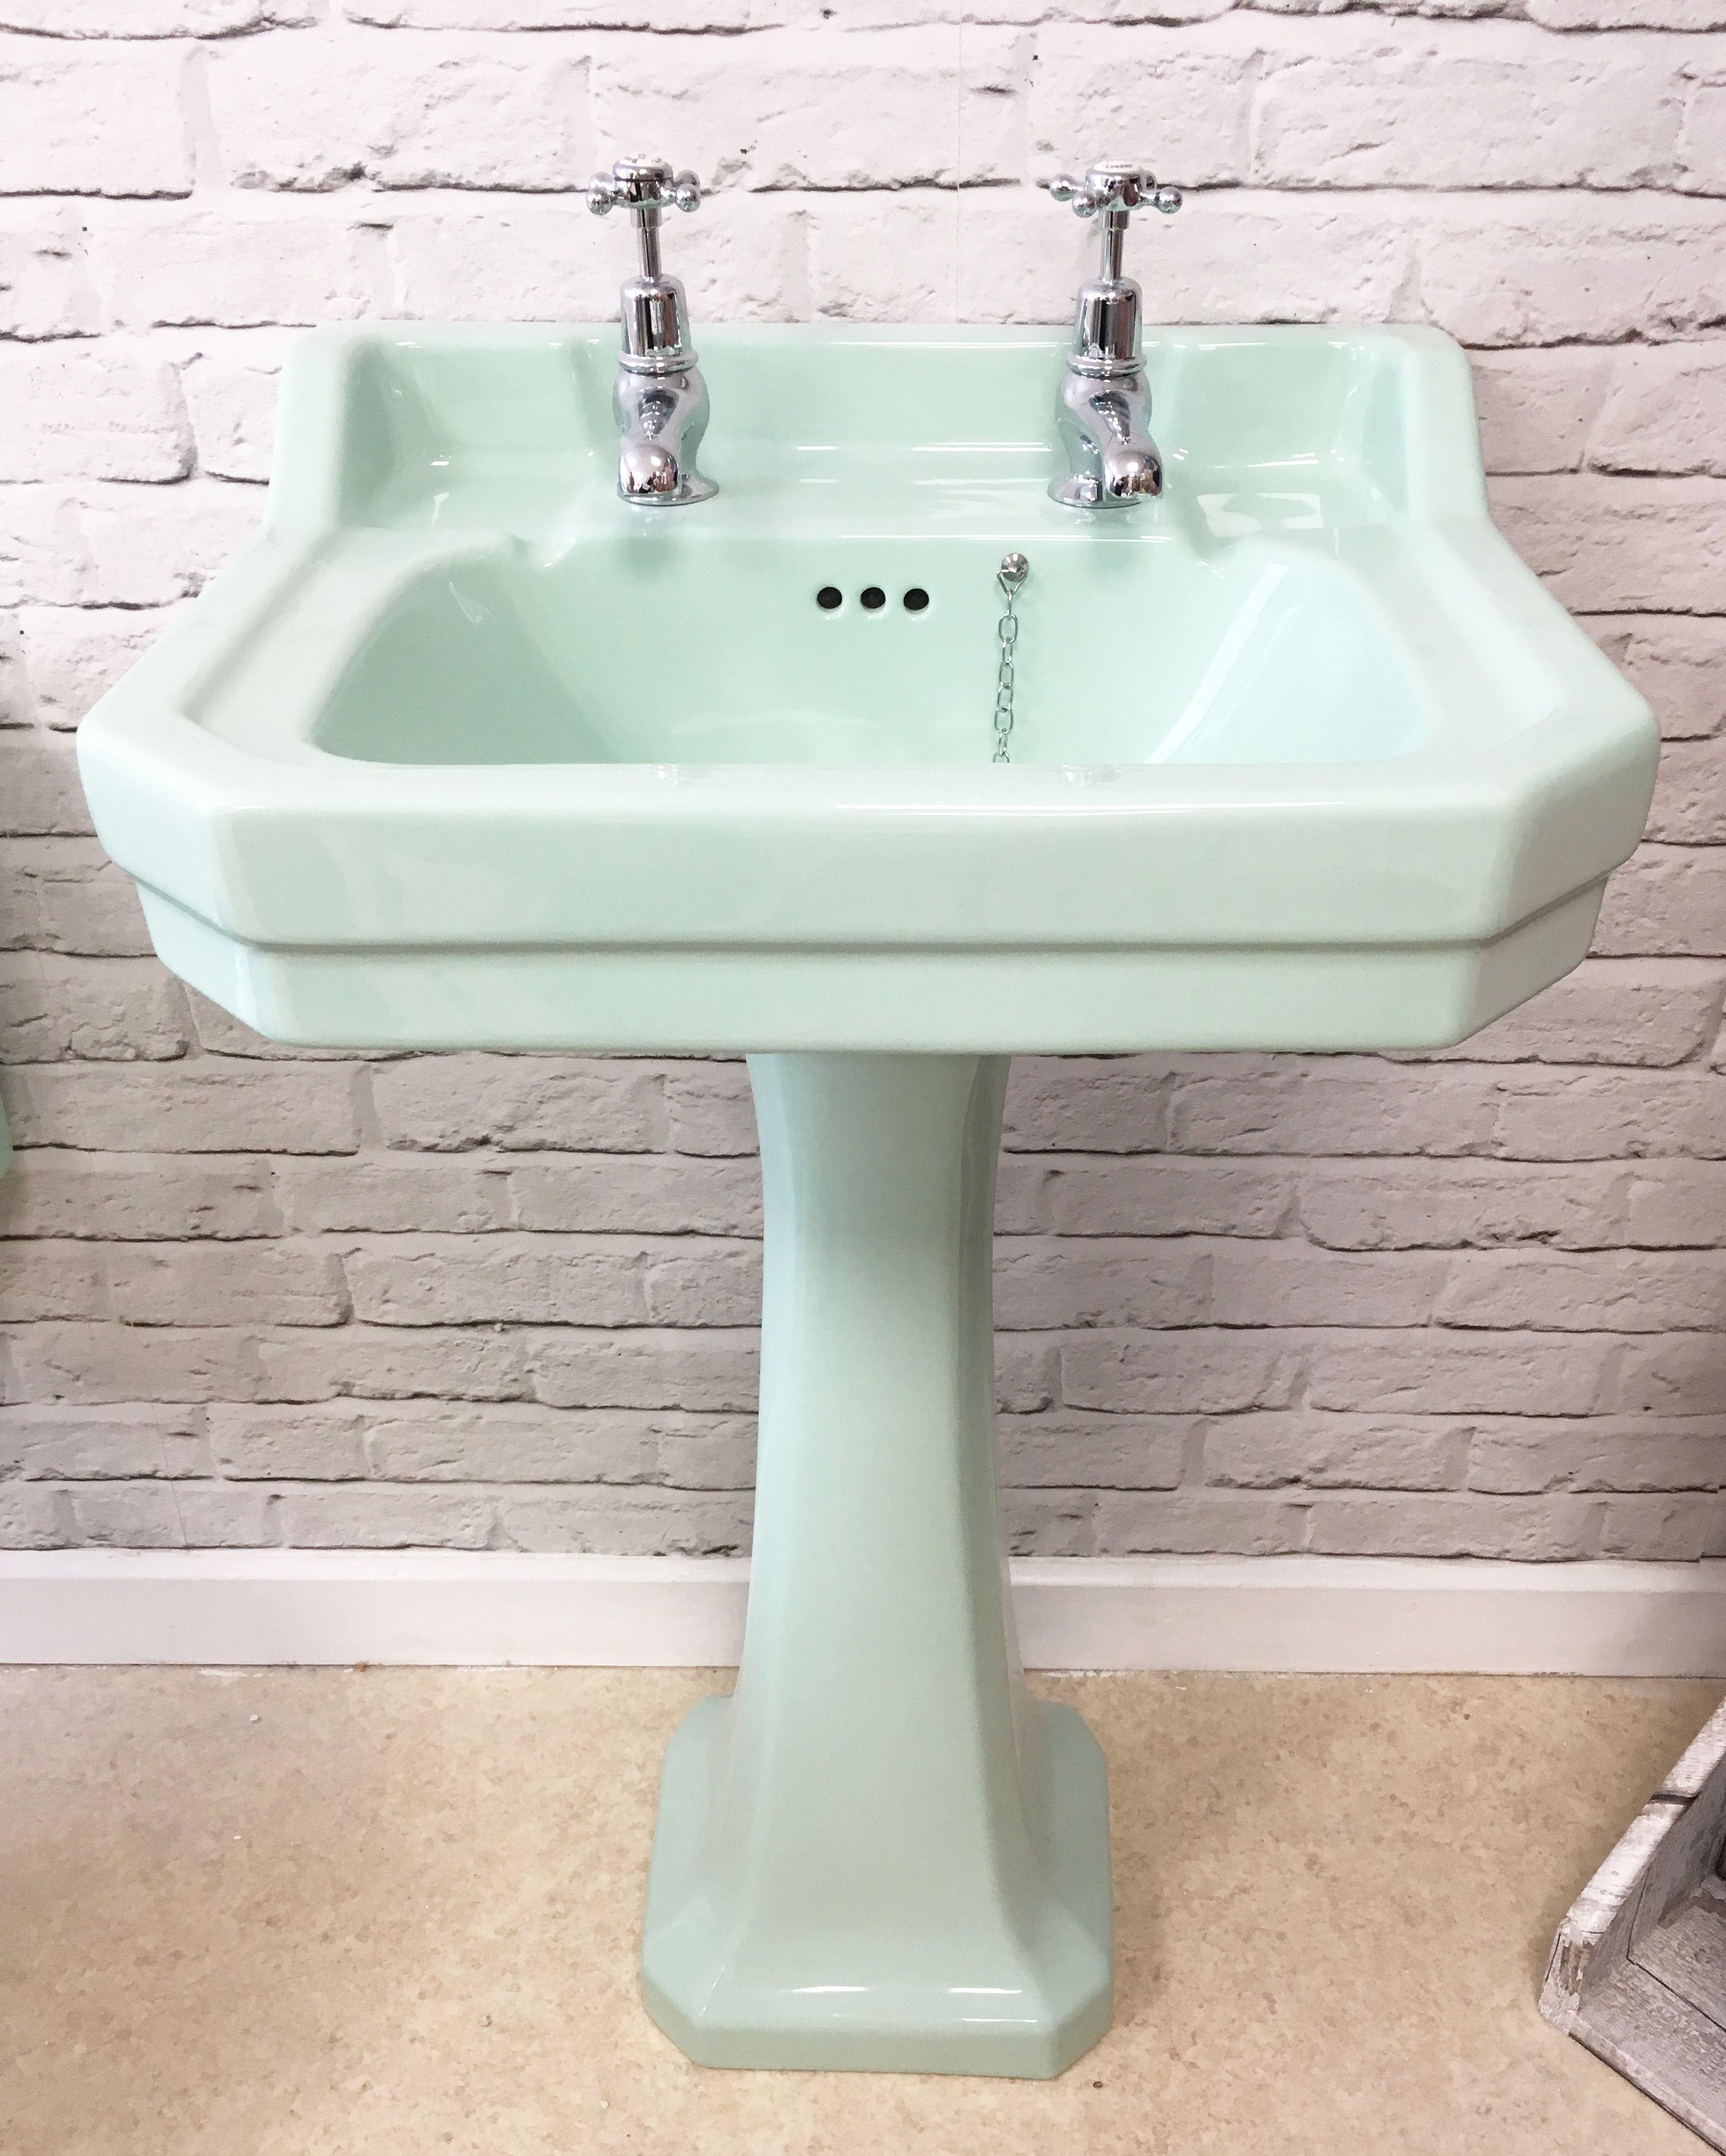 Colourful Bathrooms Bathroom Colors Vibrant Bathroom Toilet Design